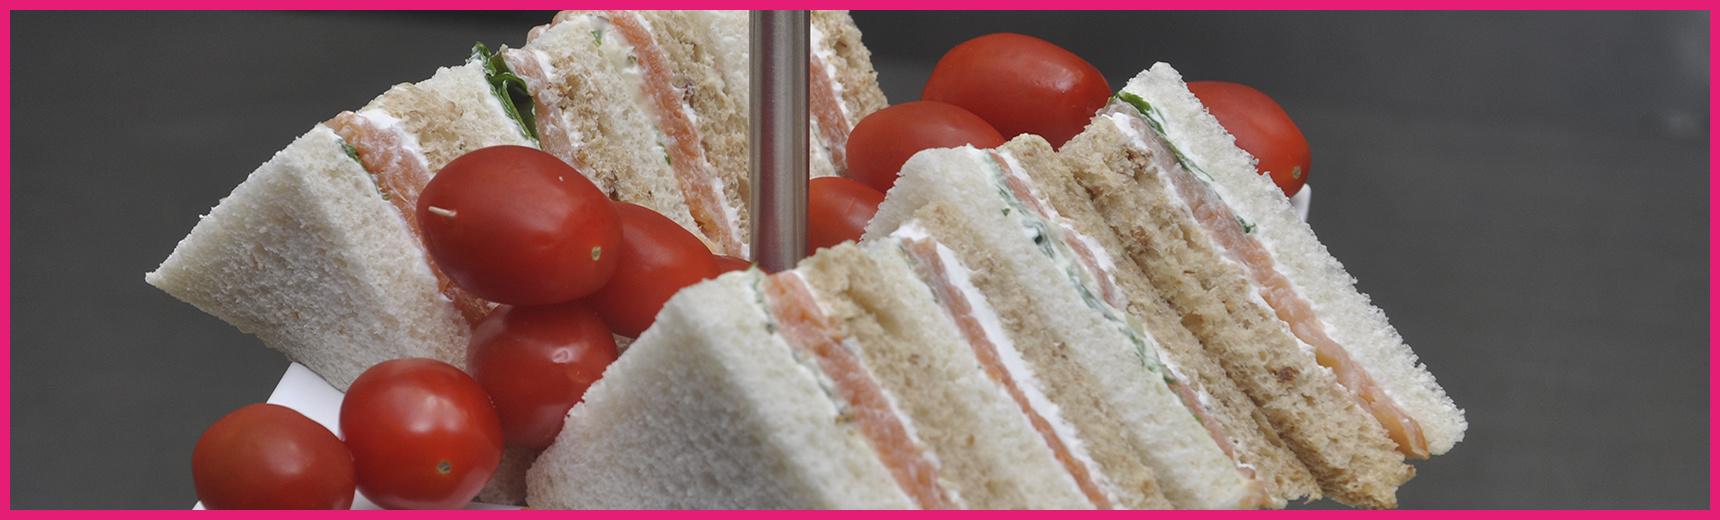 Mini Sandwiches 1